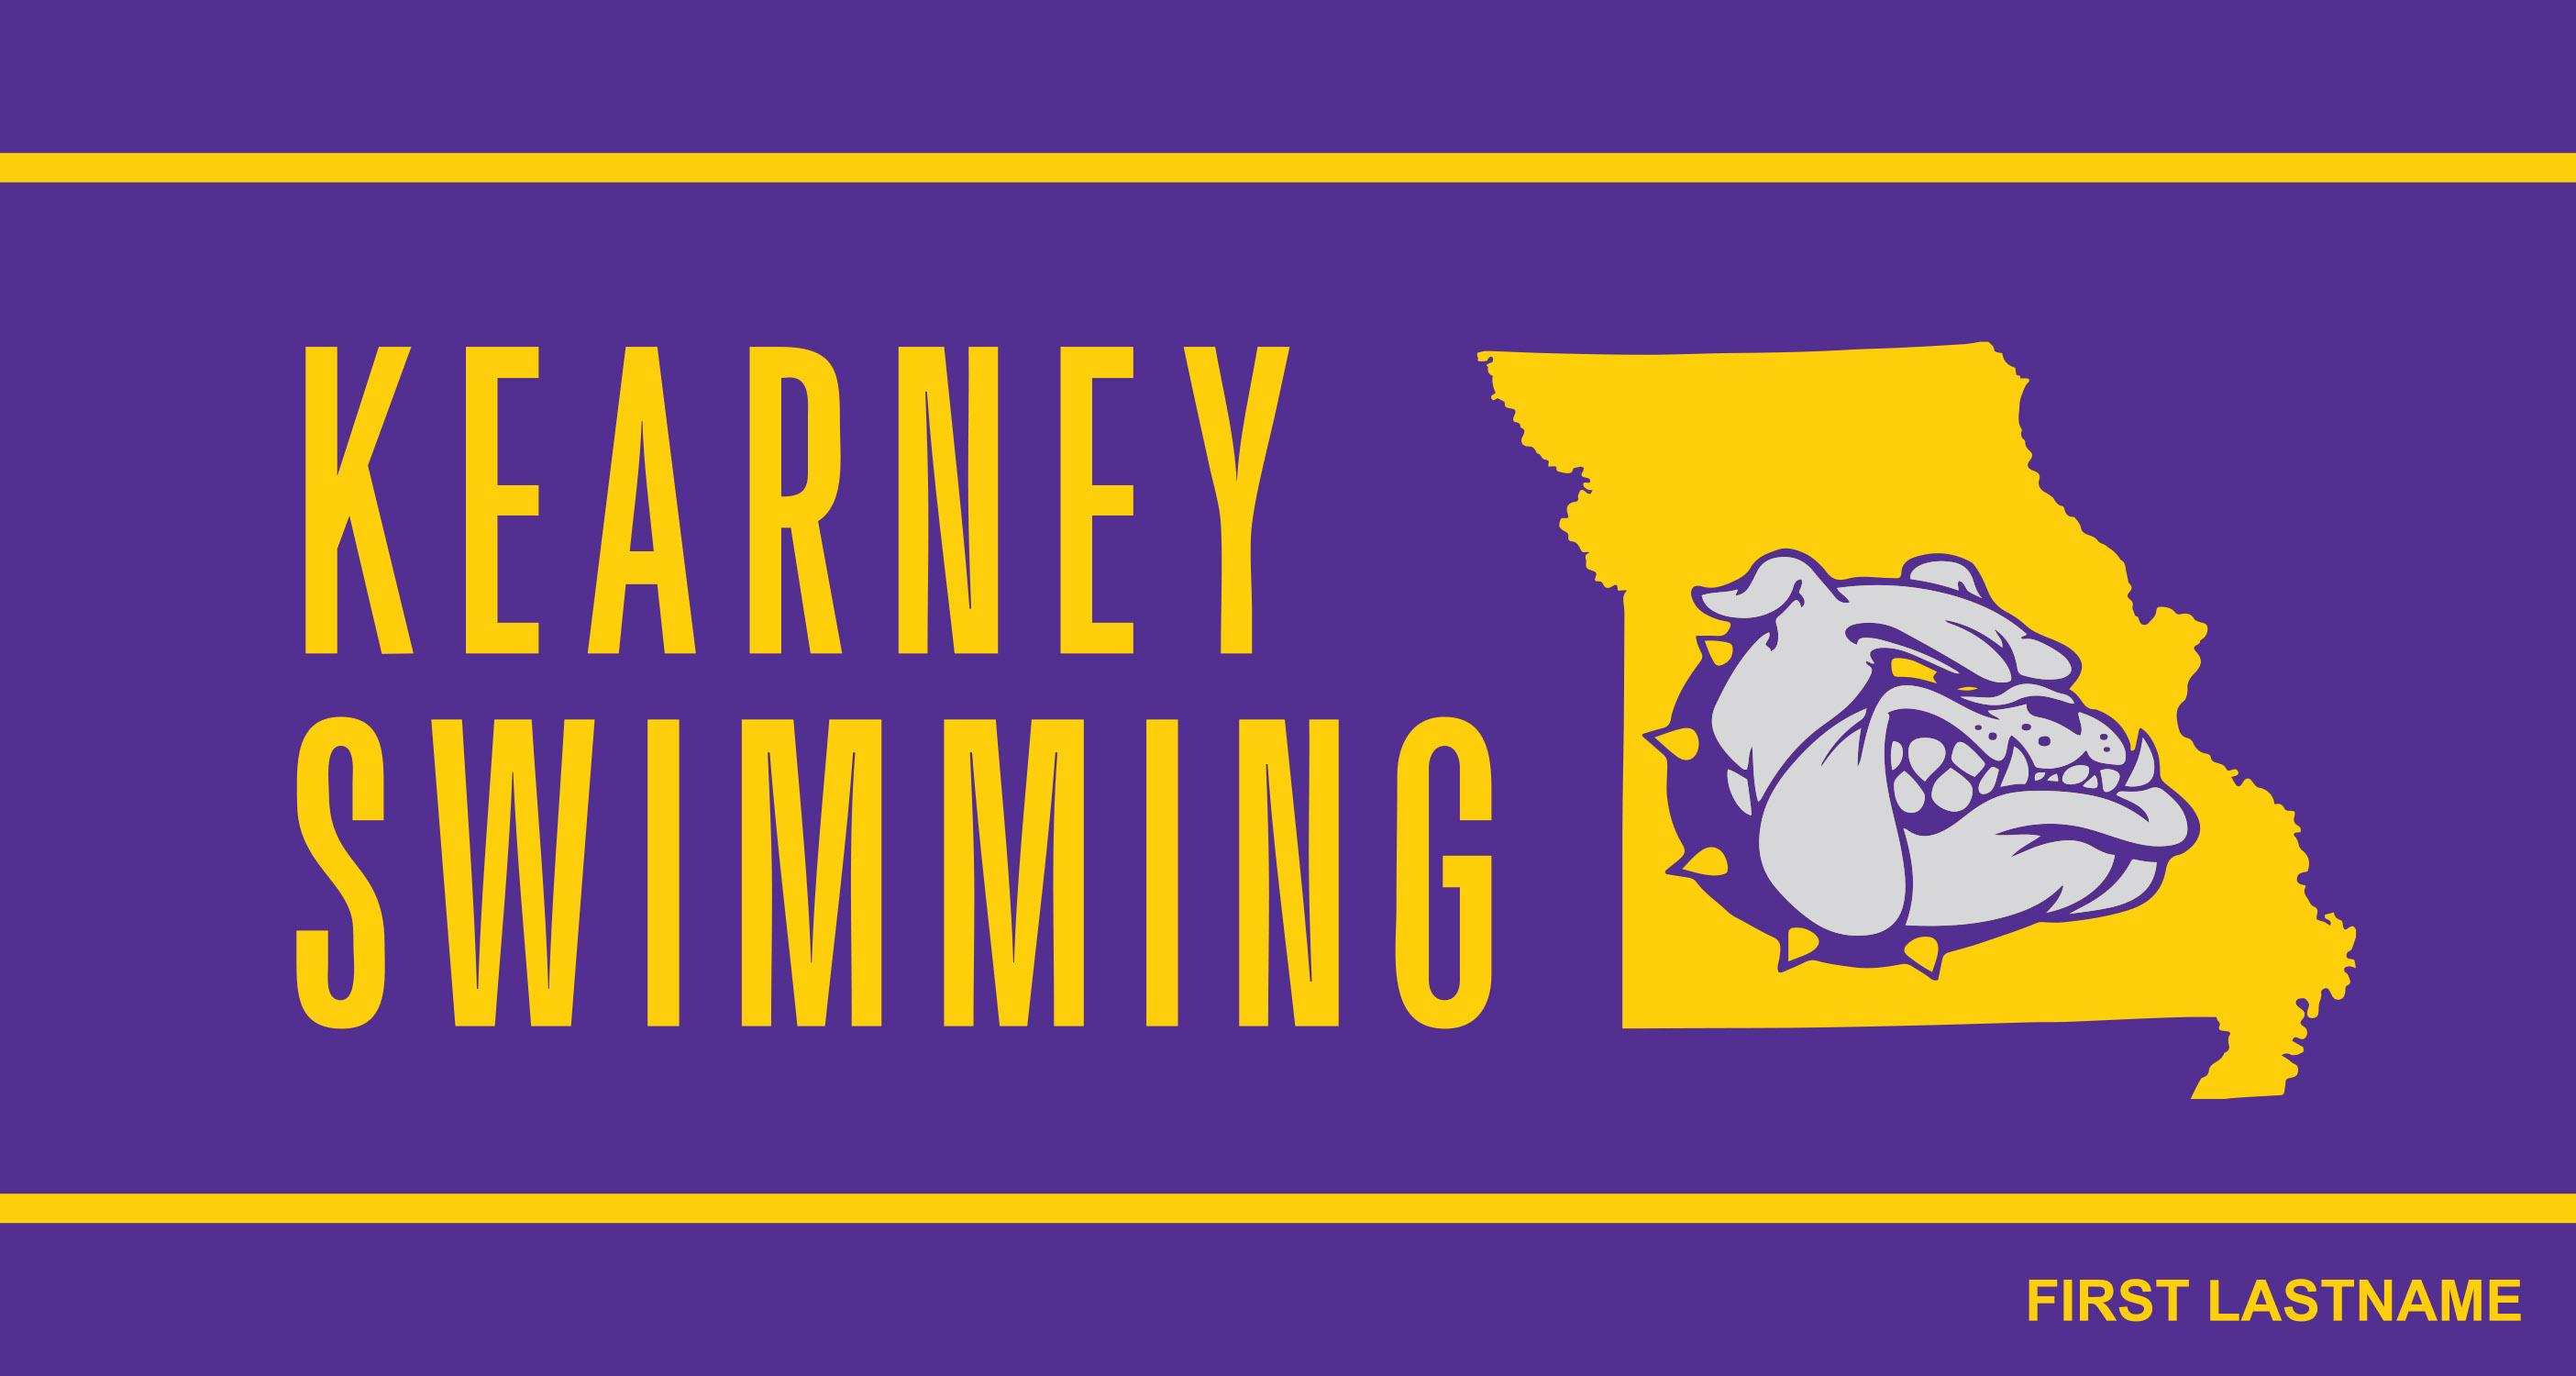 00624-KearneySwimming30x60_V2-PROOF